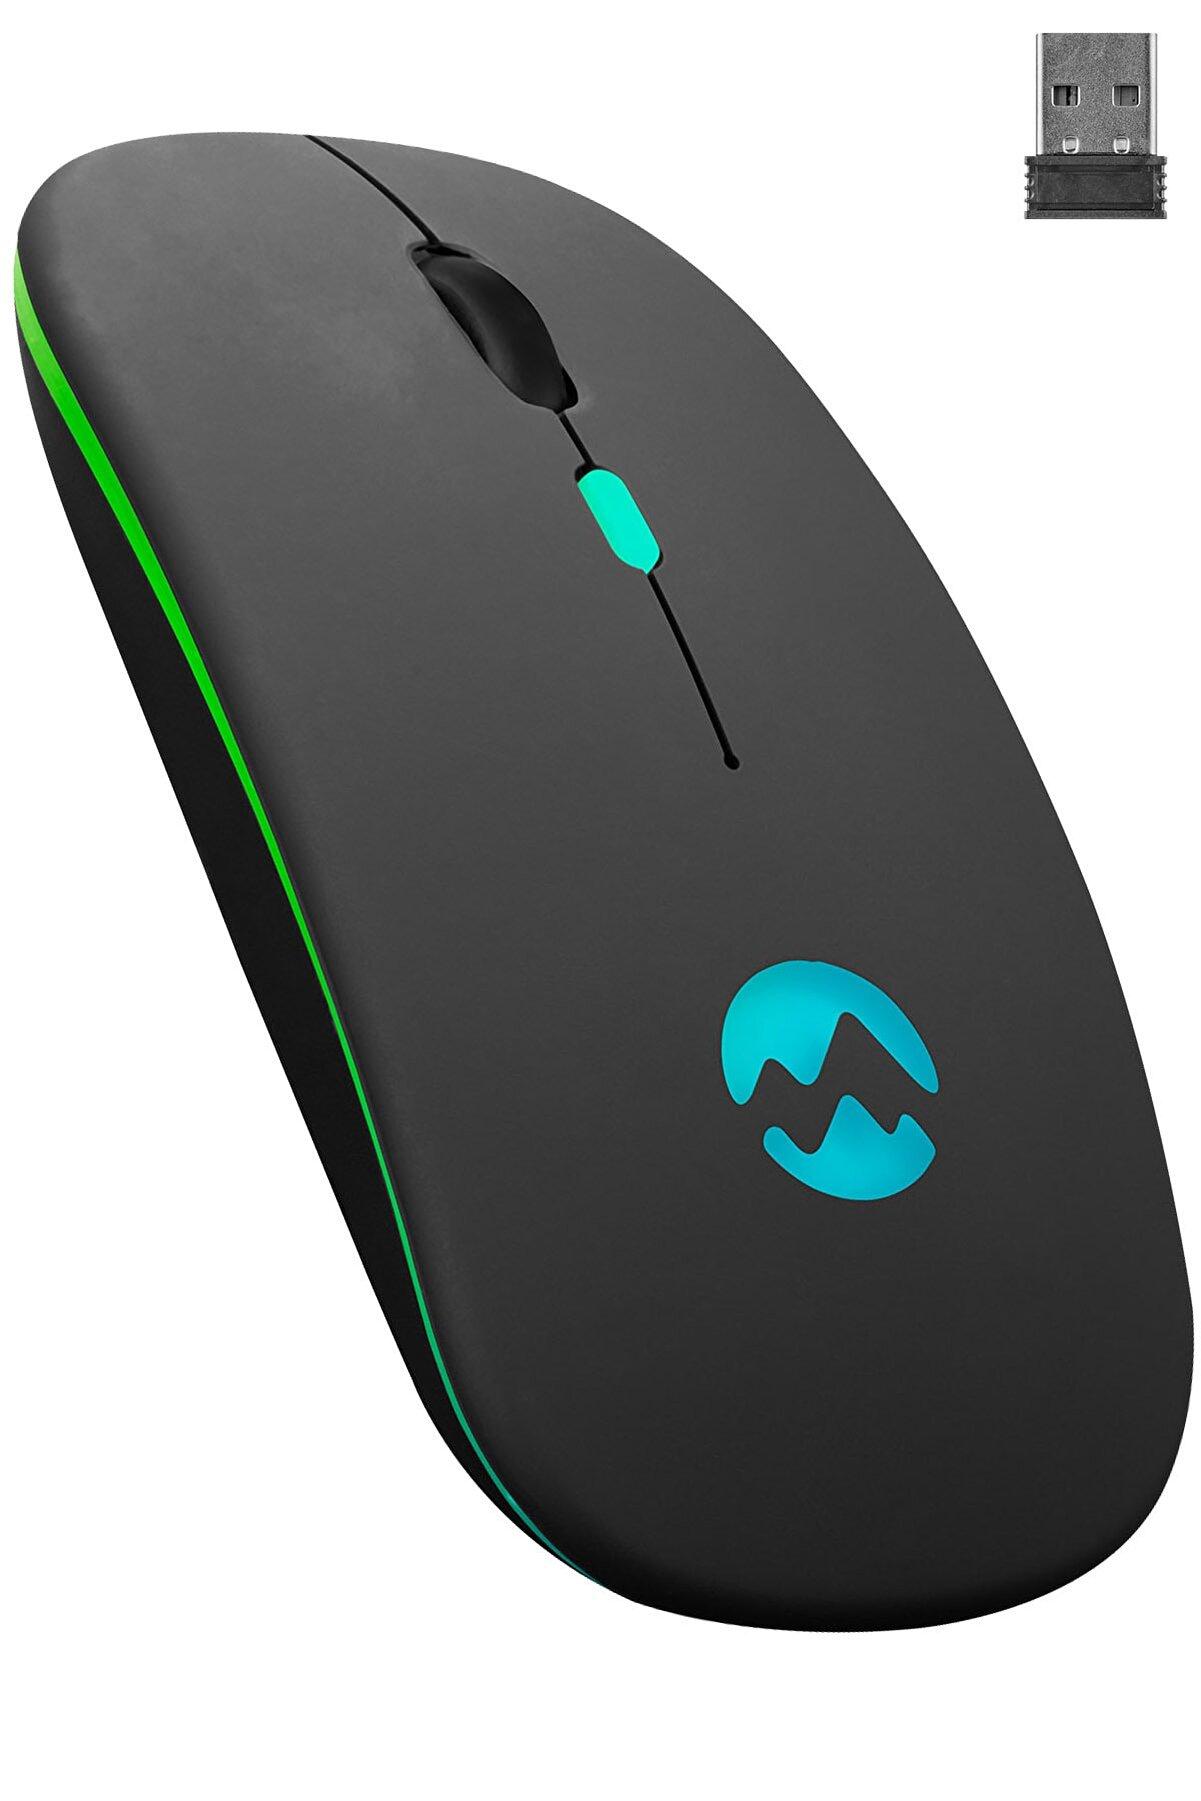 Everest Smw-710 Usb 2.4ghz Siyah Ledli 800/1200/1600dpi Şarjlı Kablosuz Mouse